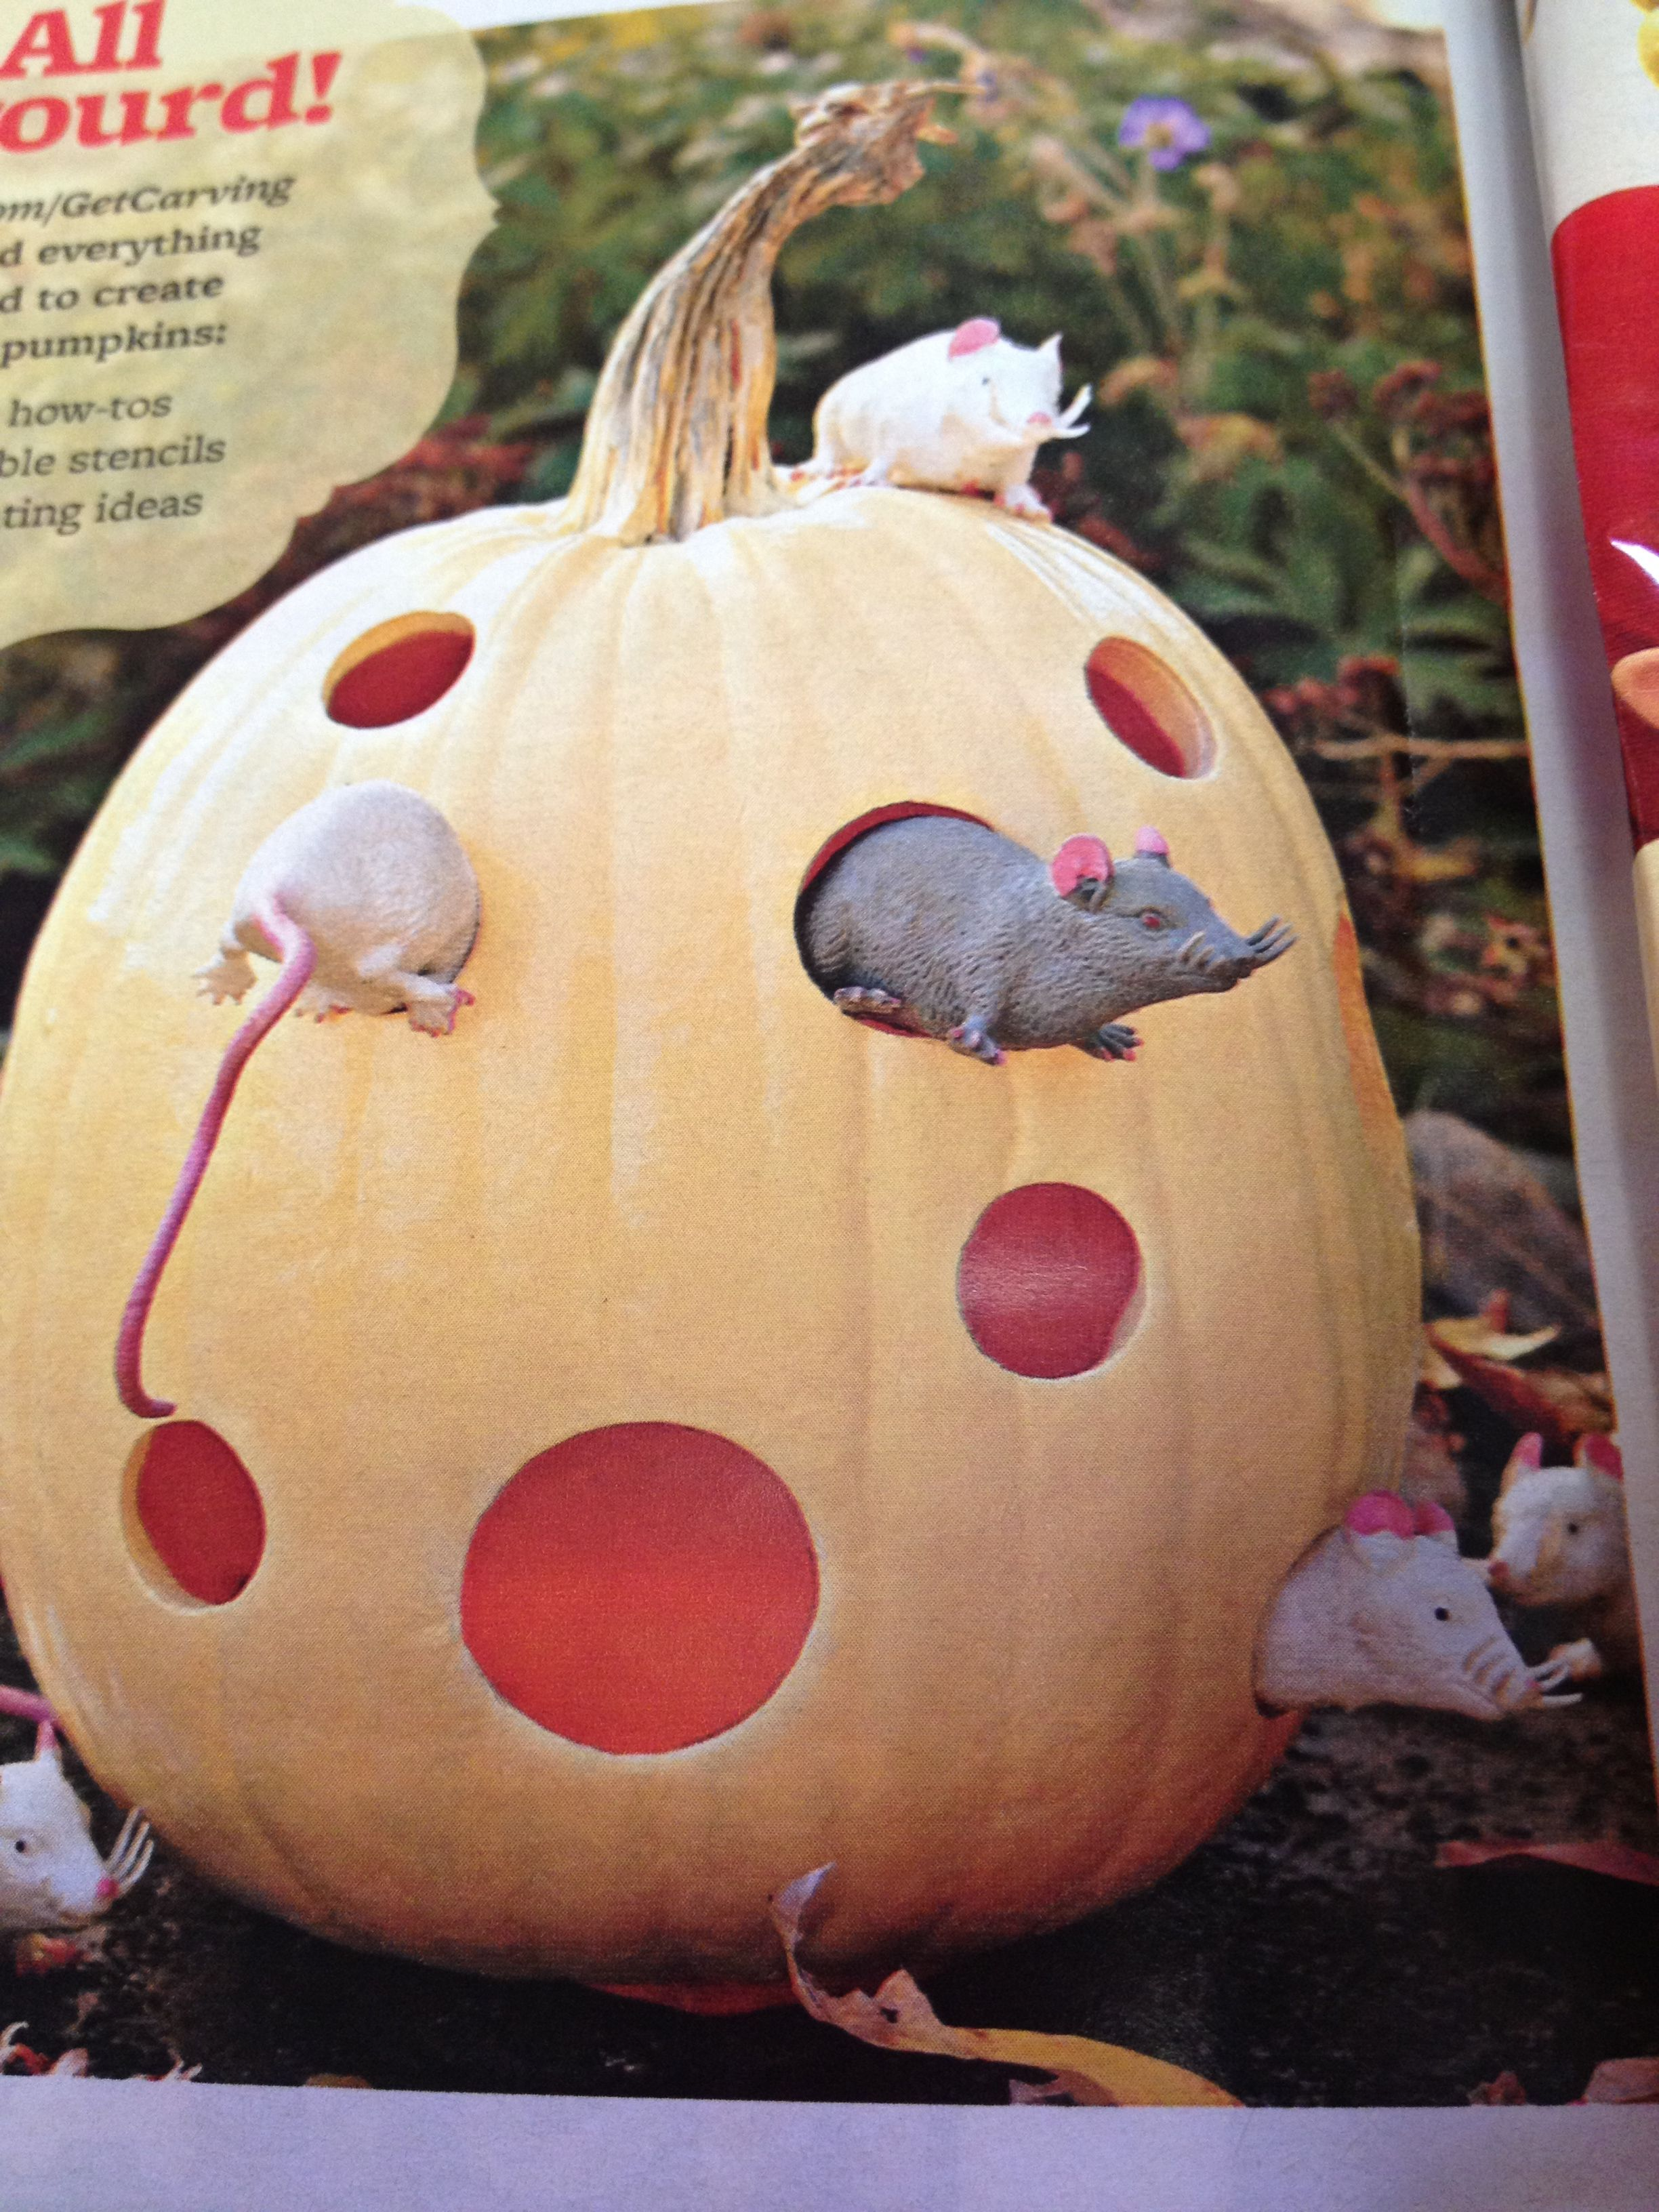 bdff498e8d346d37a9453ac9aef6a77a - Better Homes And Gardens Halloween Tricks And Treats Magazine 2017